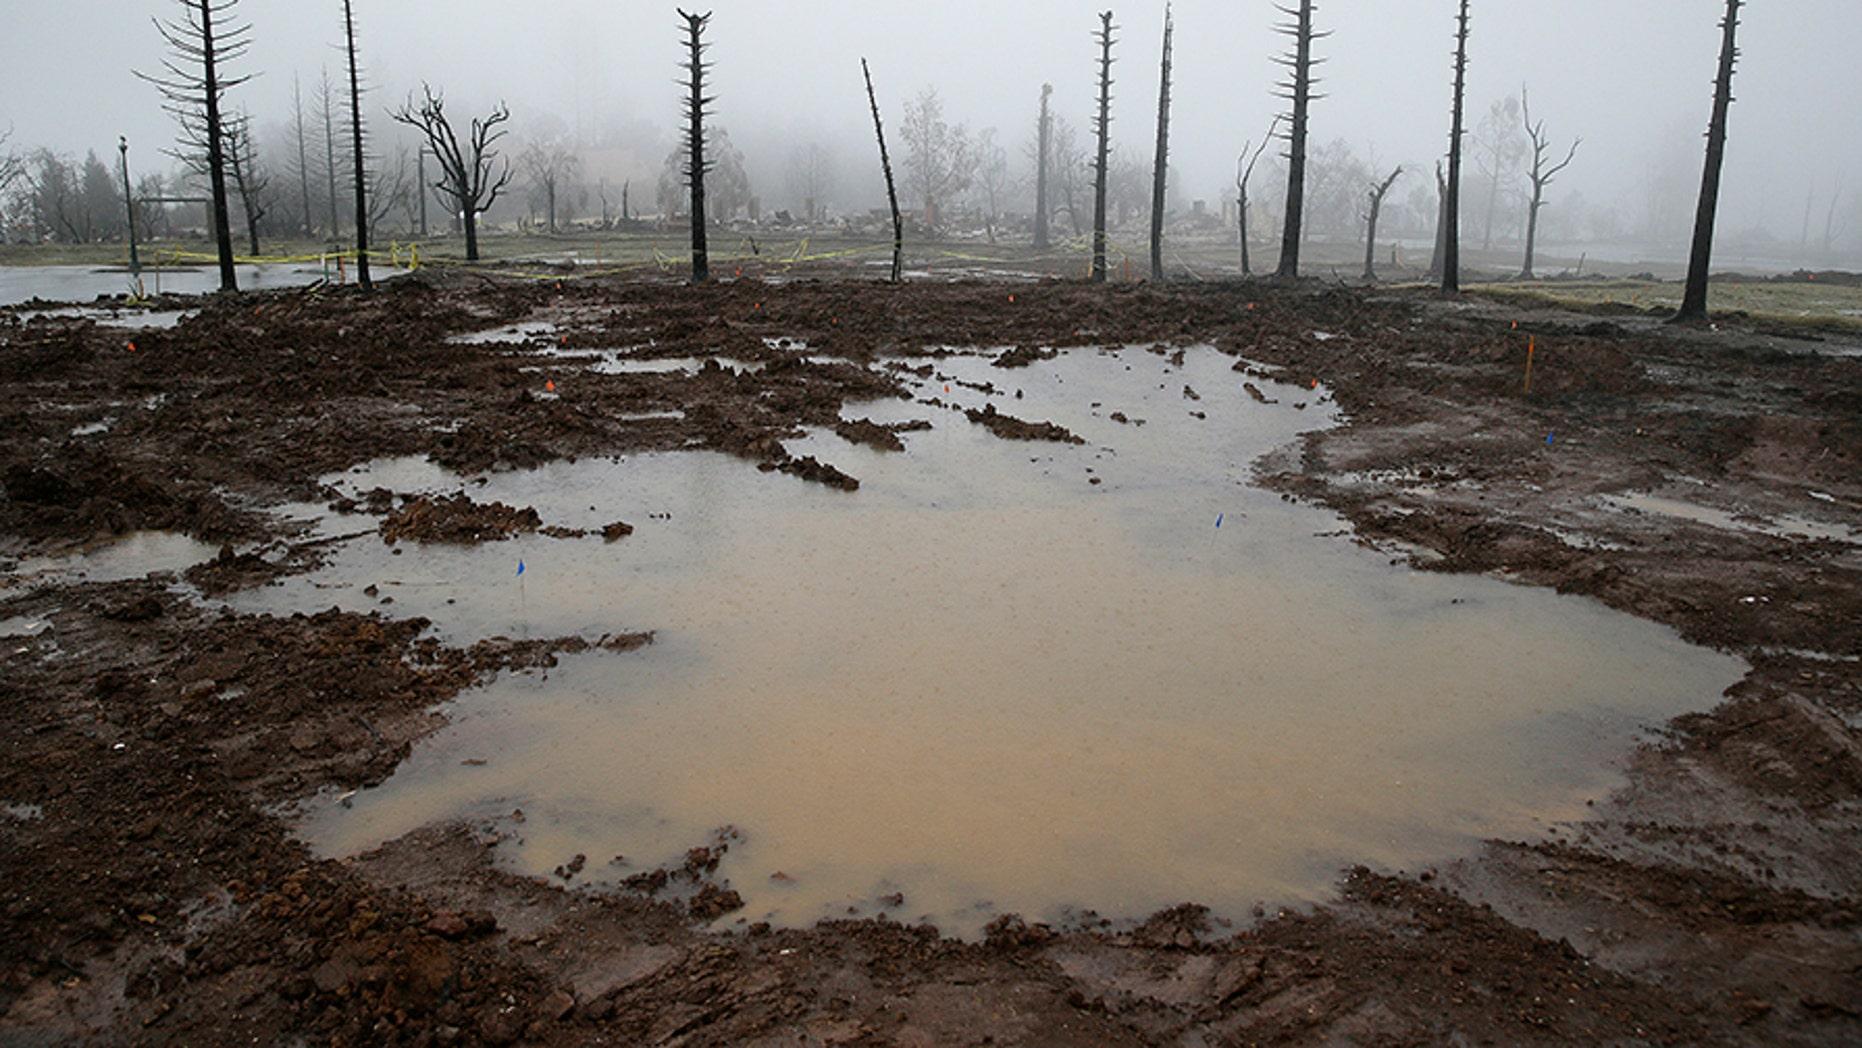 Rain water pools where a Fountaingrove neighborhood home once stood Monday in Santa Rosa, Calif.